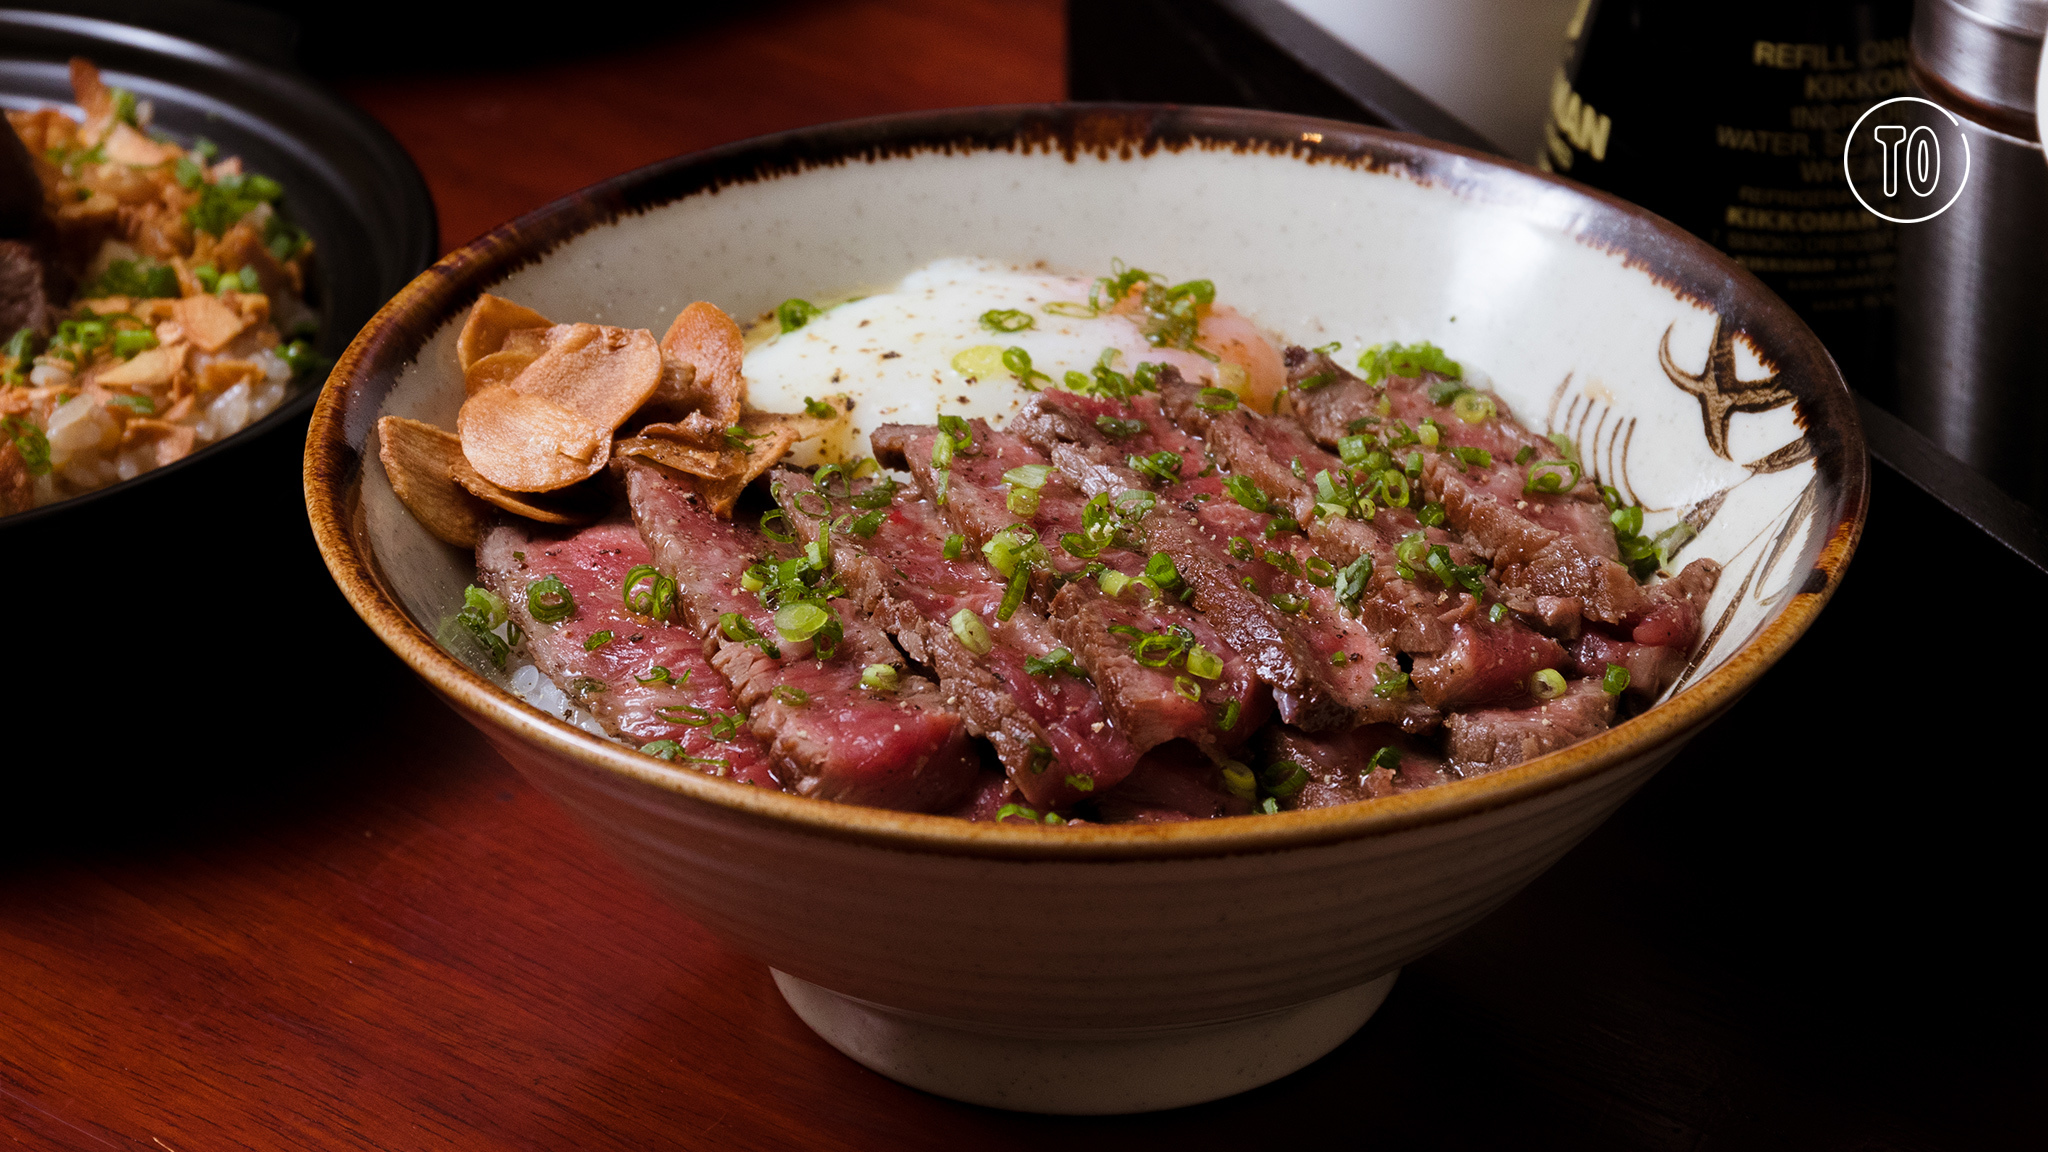 Asian-style beef restaurants